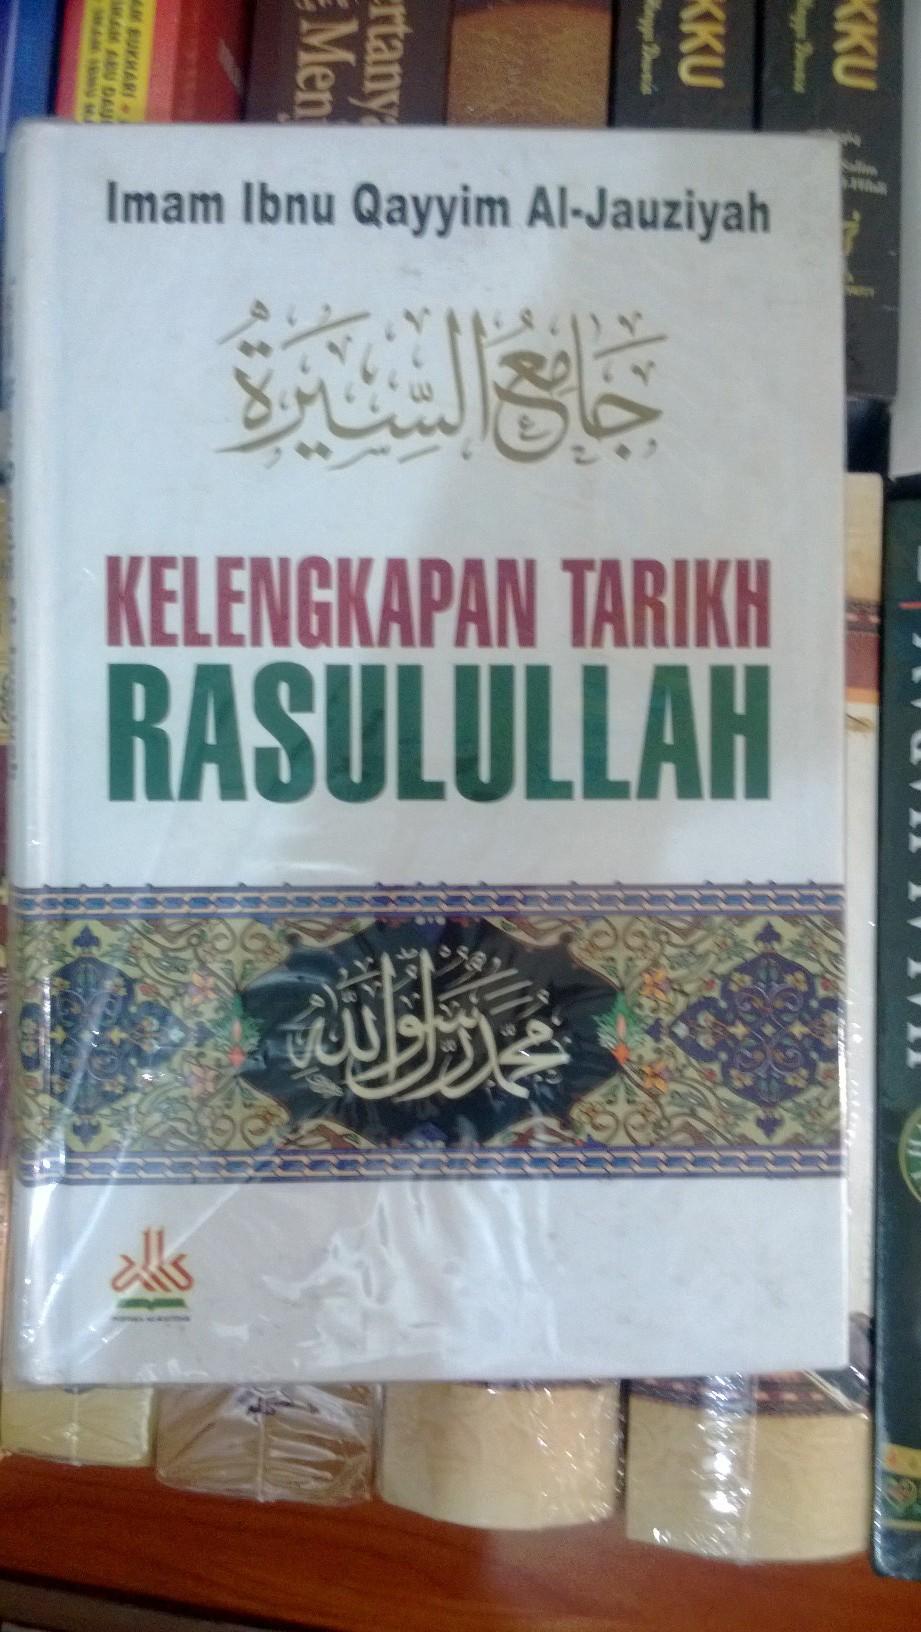 Muhammad - Ibnul